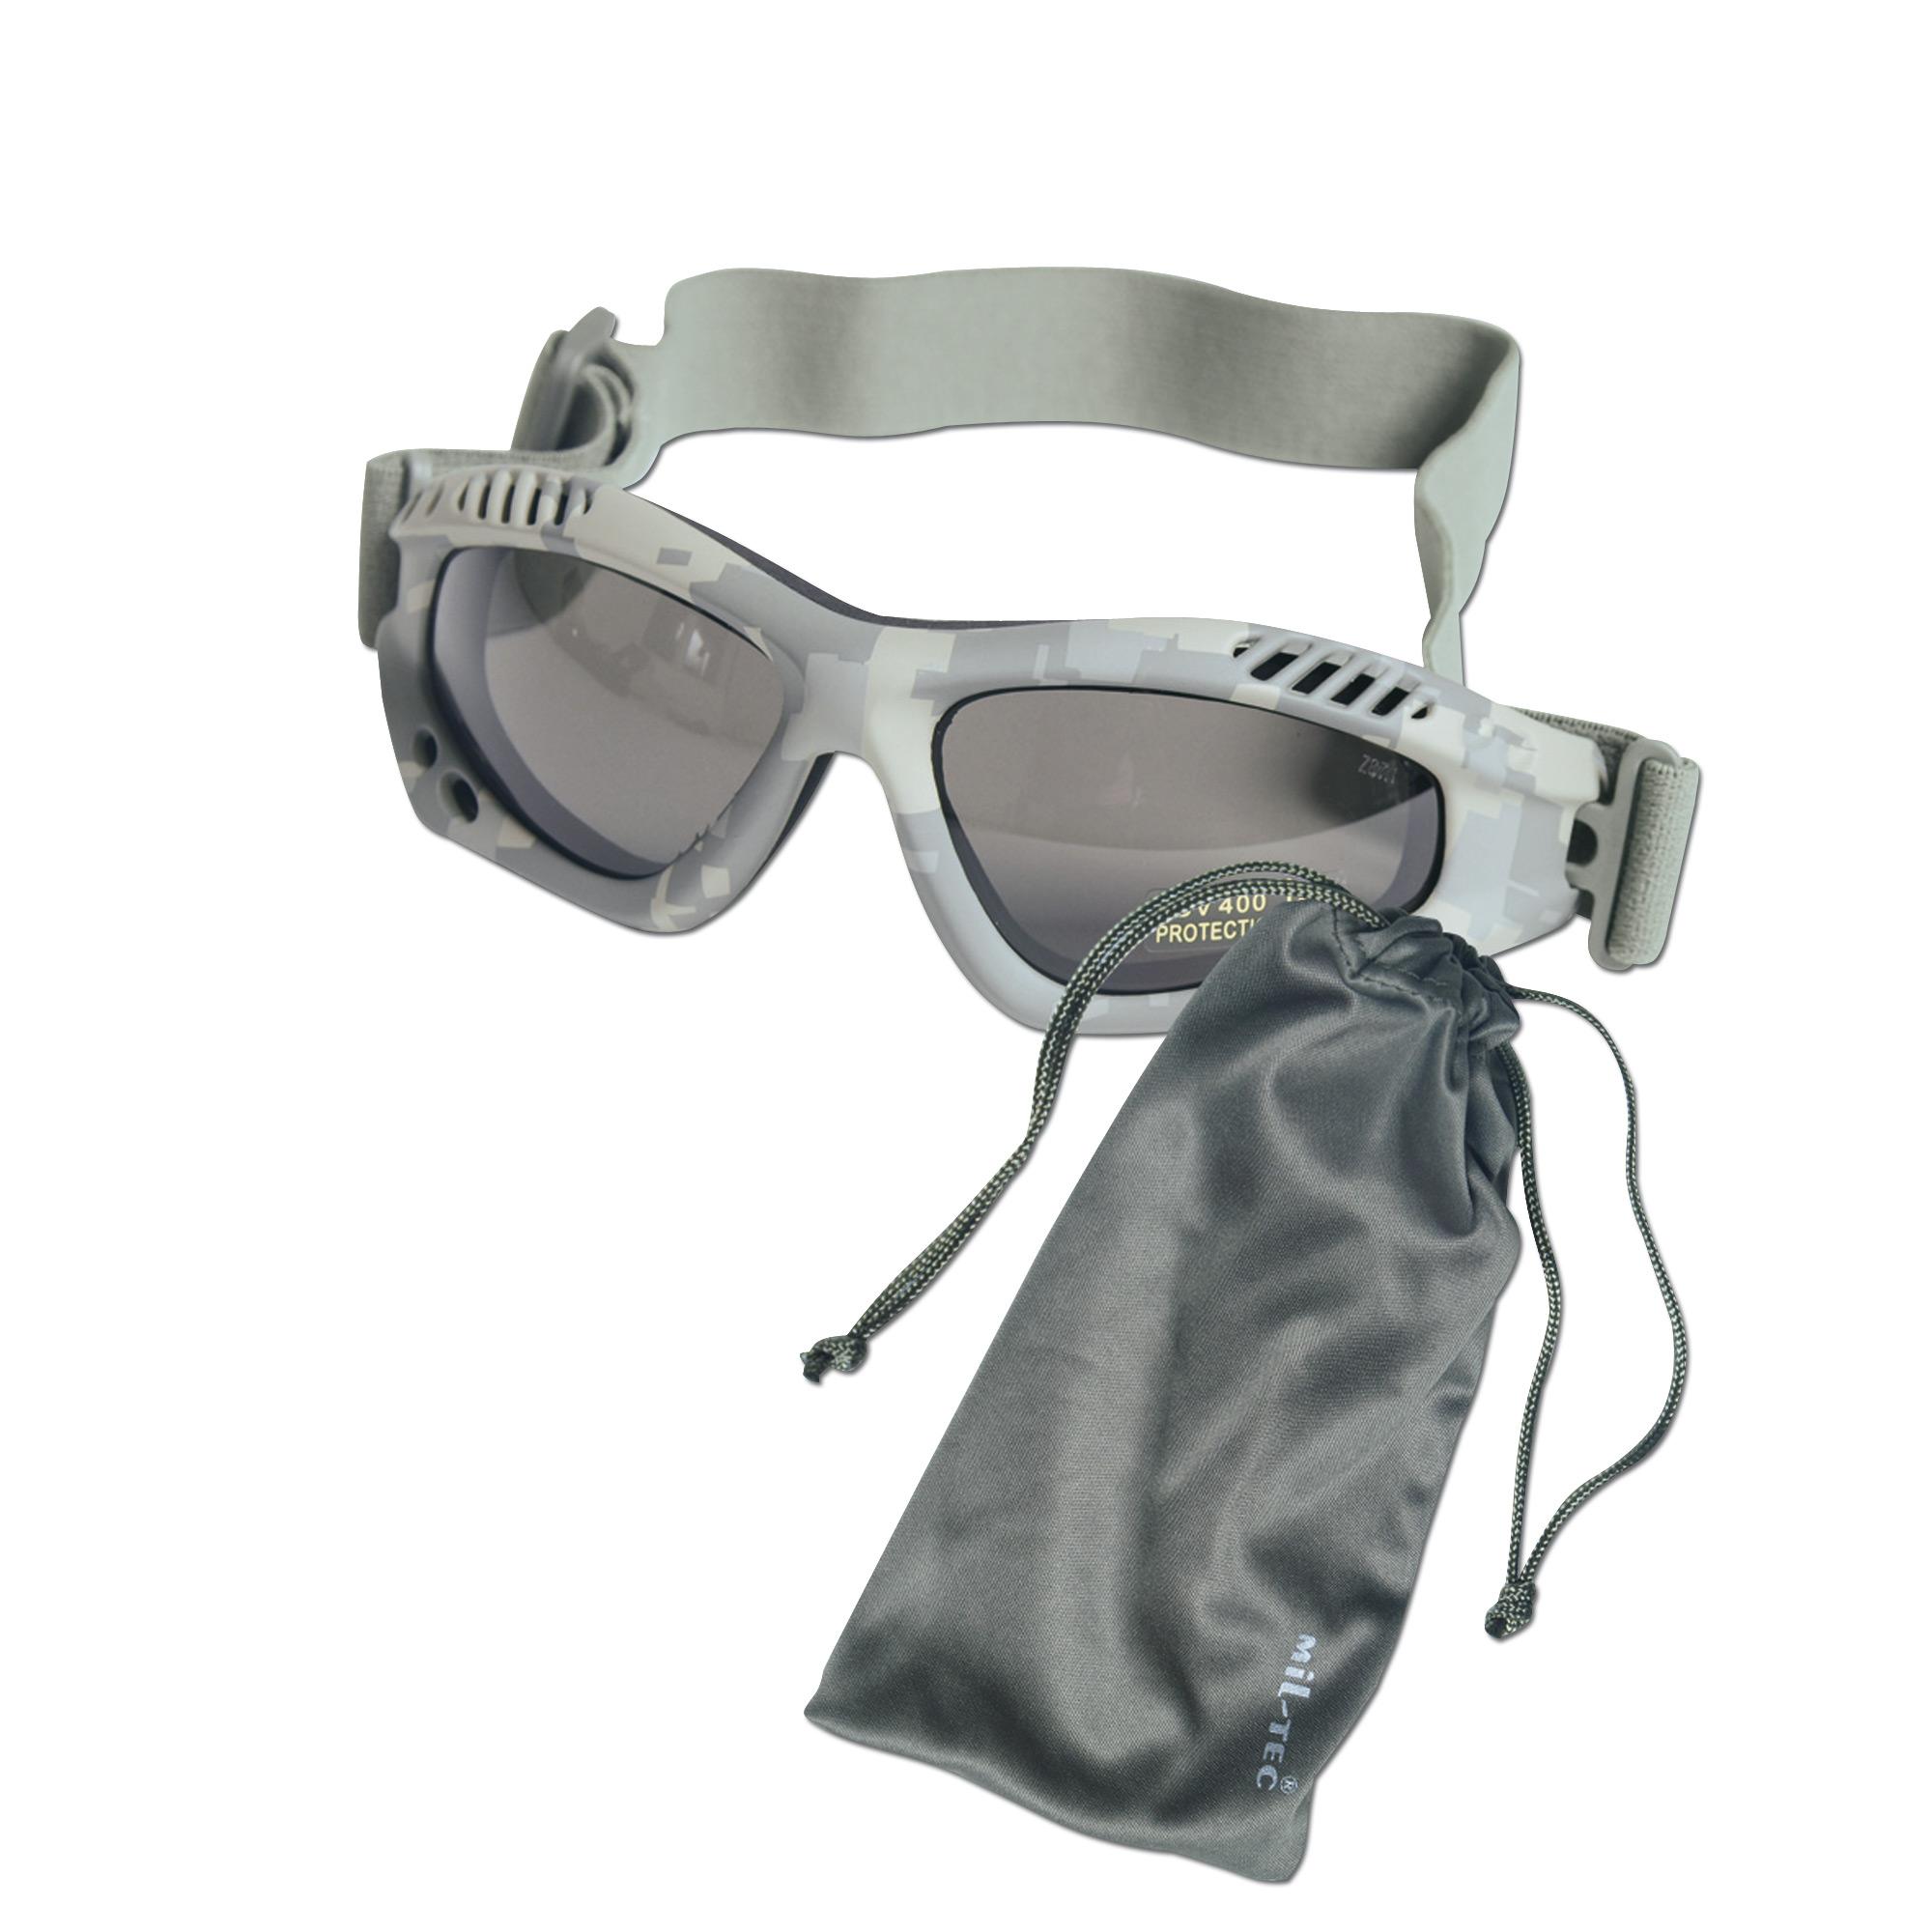 Brille Commando Air-Pro AT-digital smoke